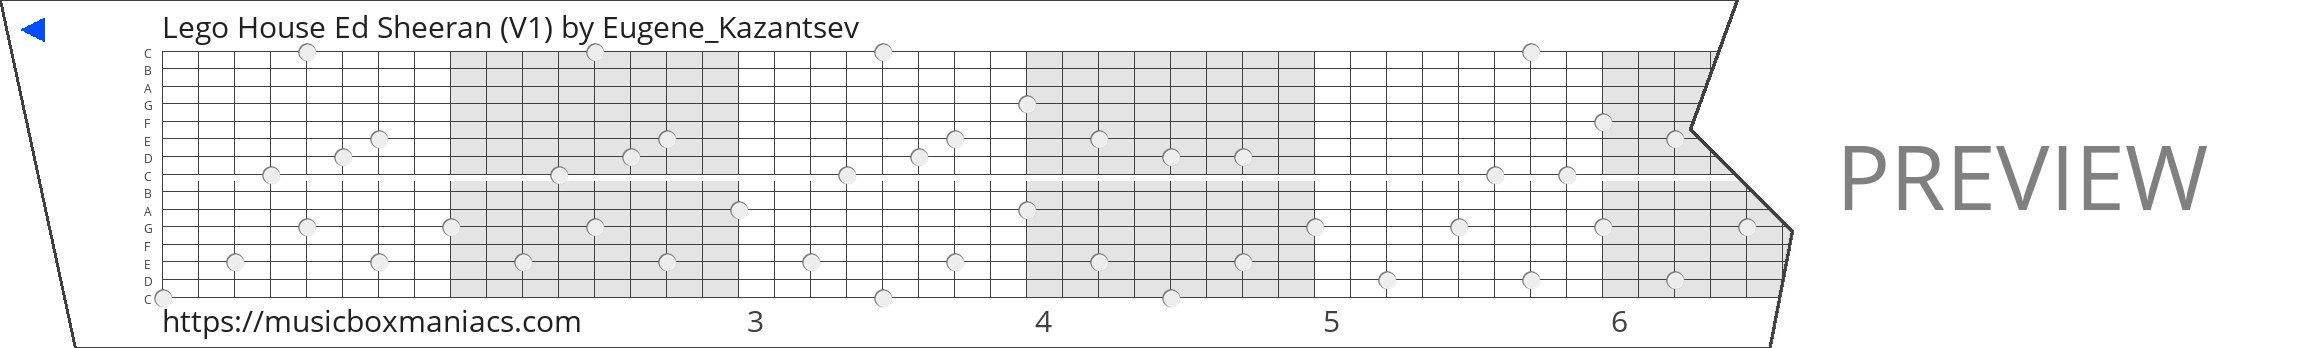 Lego House Ed Sheeran (V1) 15 note music box paper strip